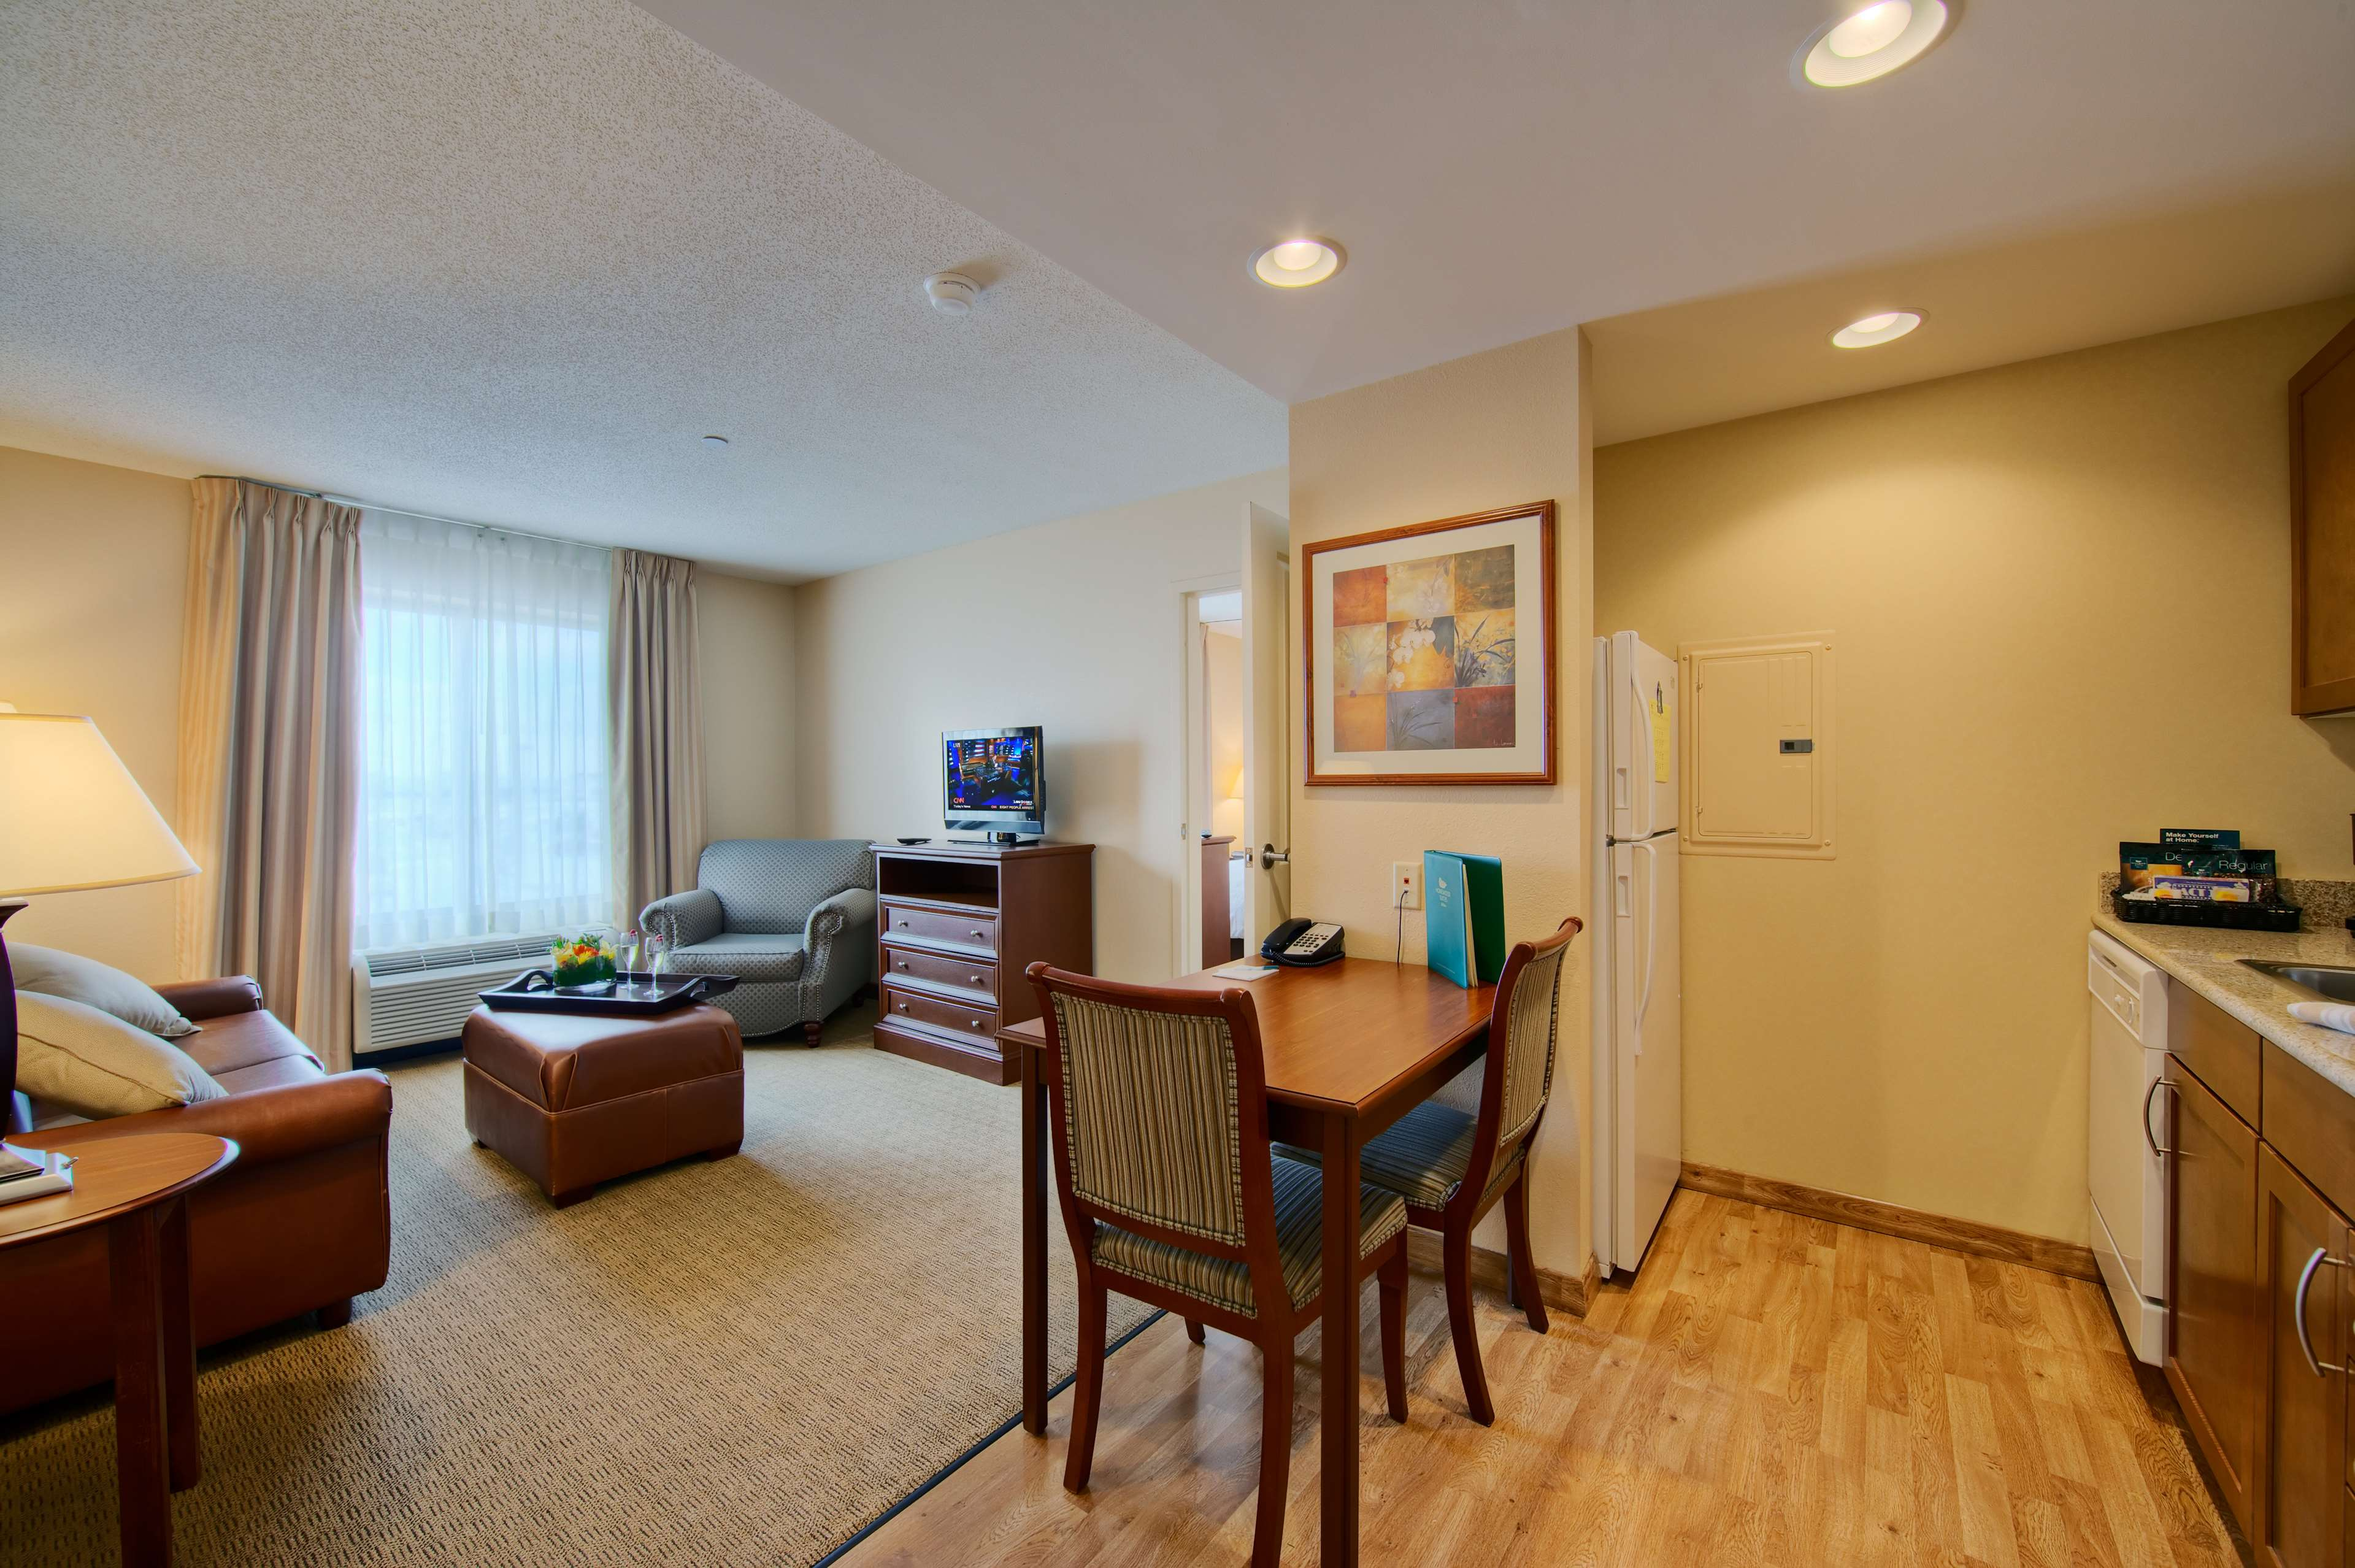 Homewood Suites by Hilton Orland Park image 21